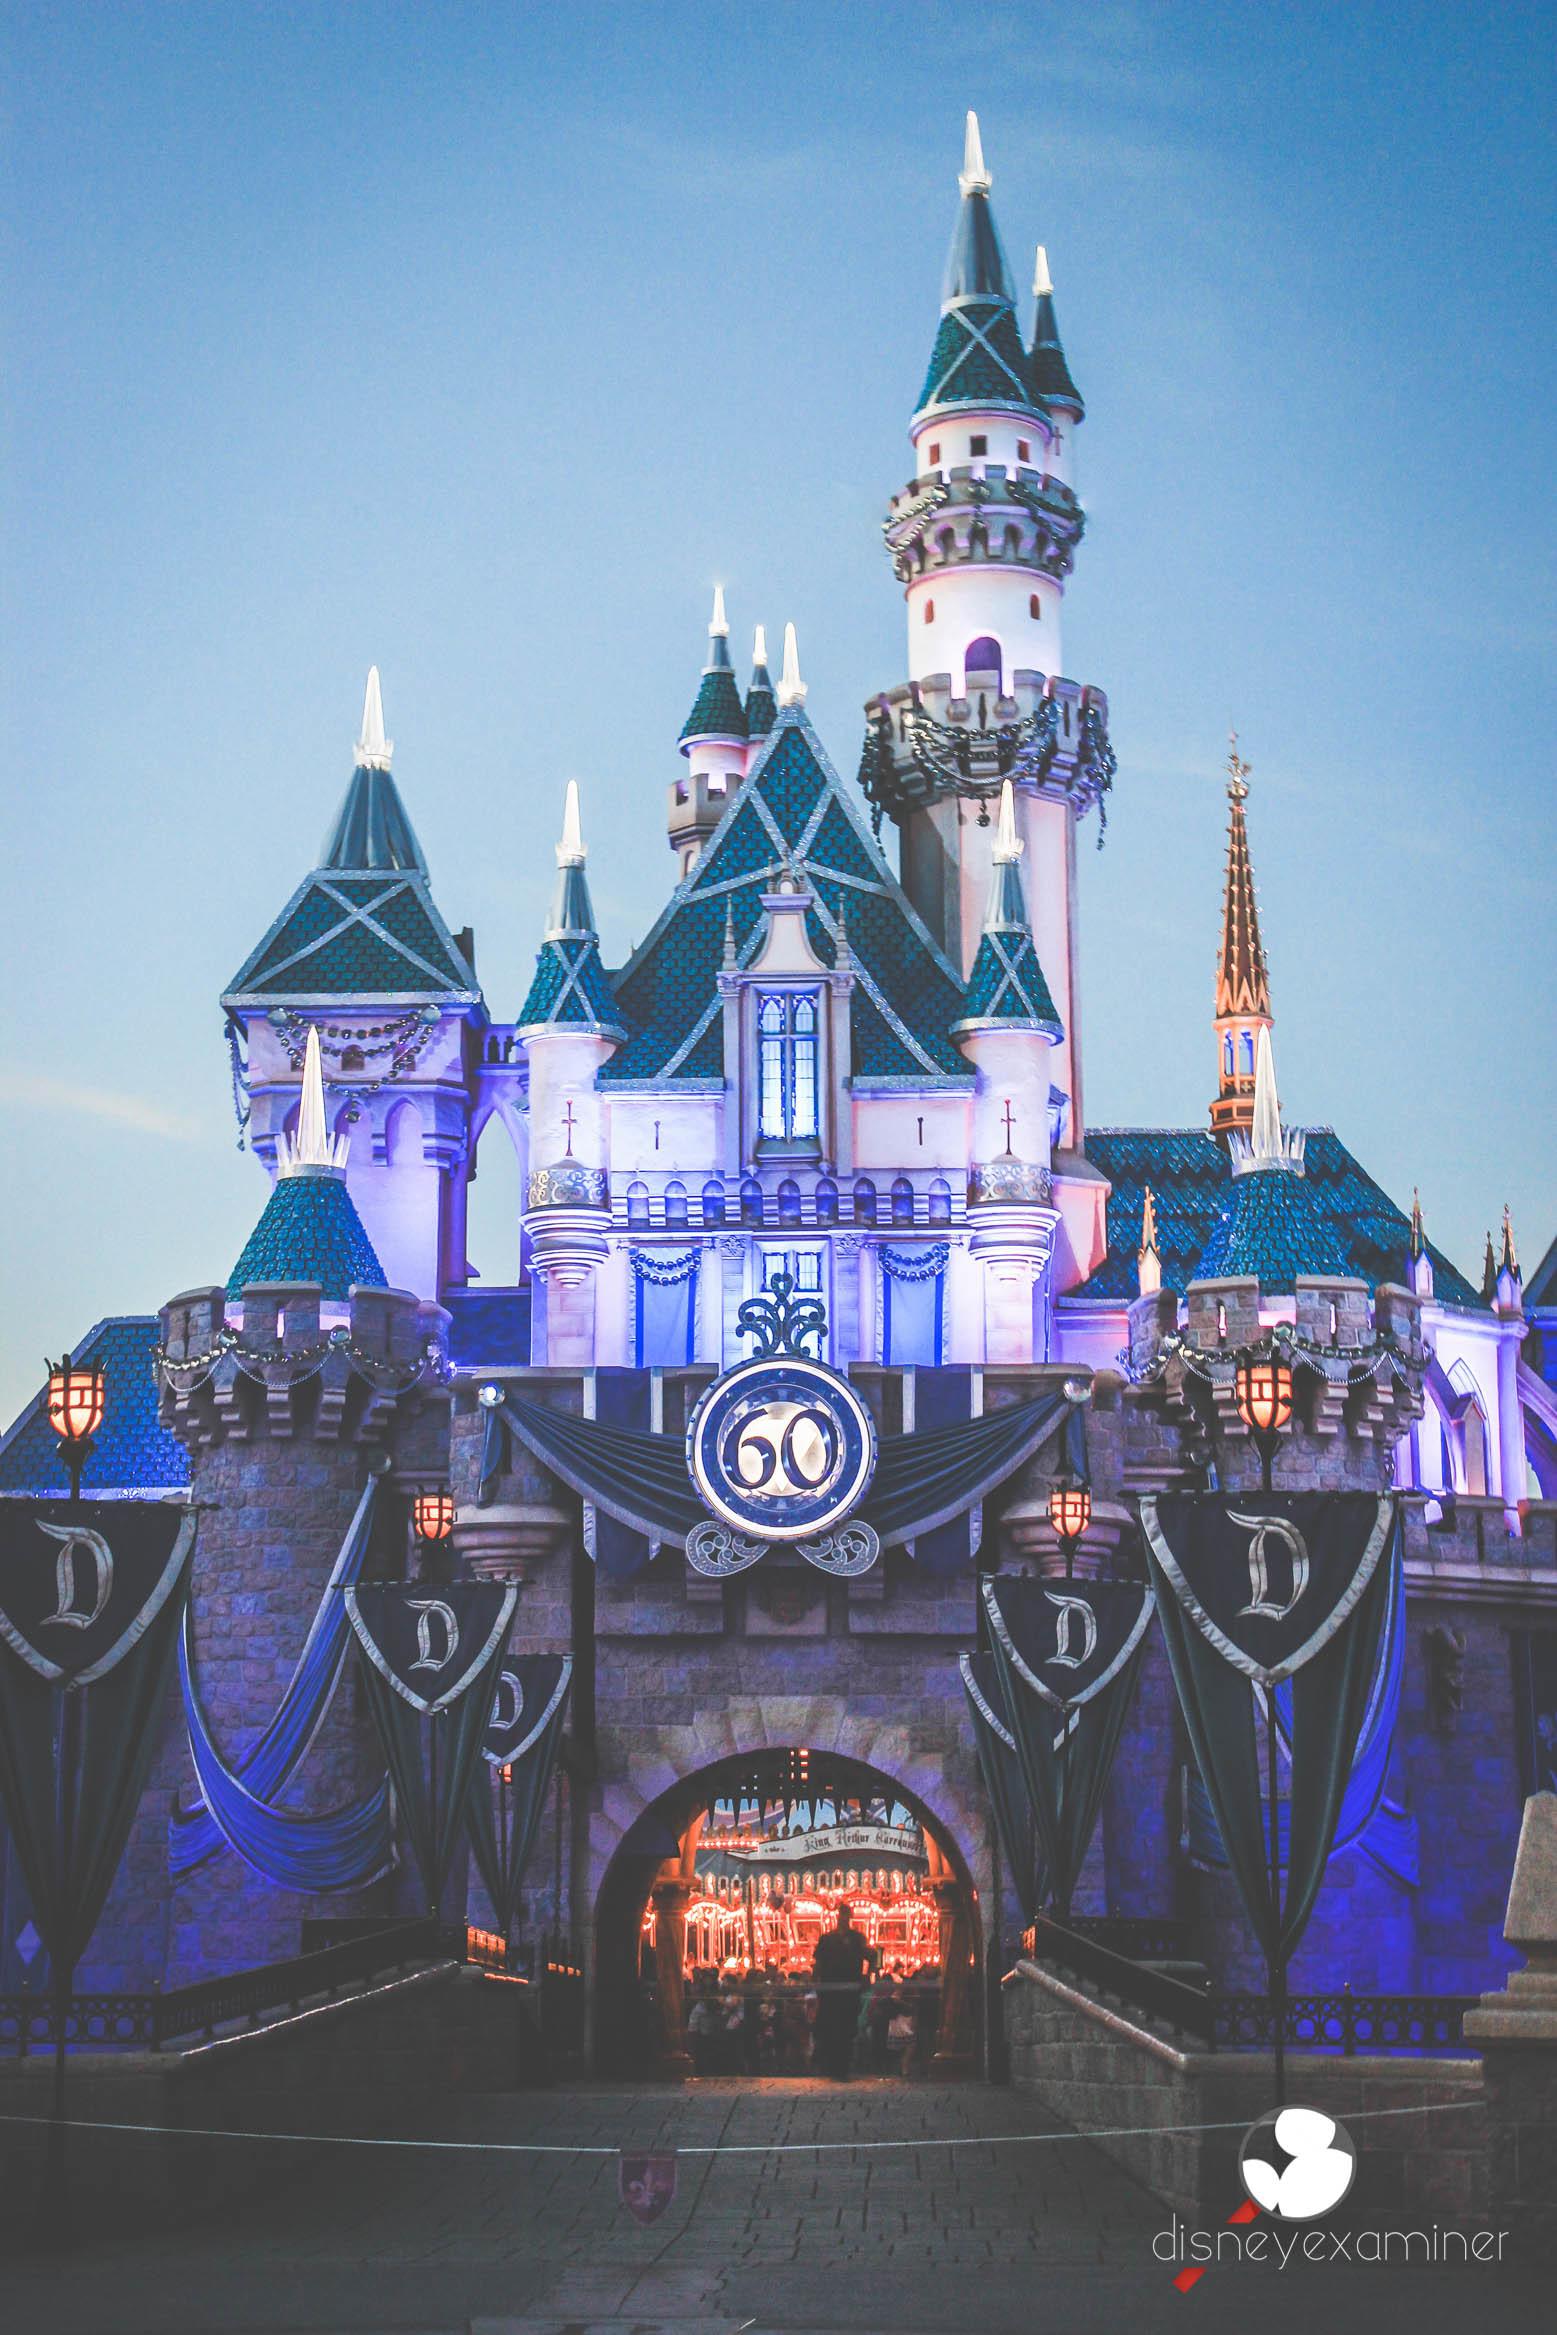 Disney castle iphone wallpaper 74 images - Disney world wallpaper iphone ...